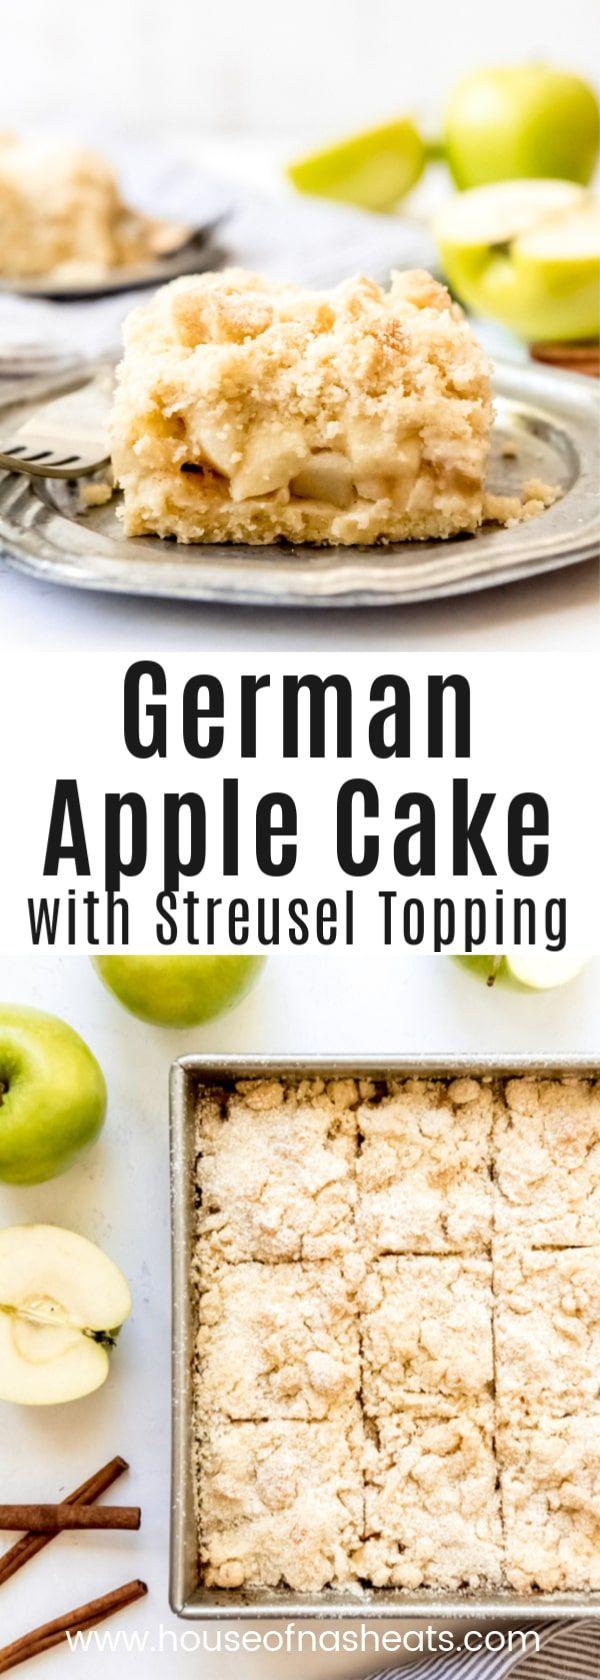 German Apple Cake with Streusel